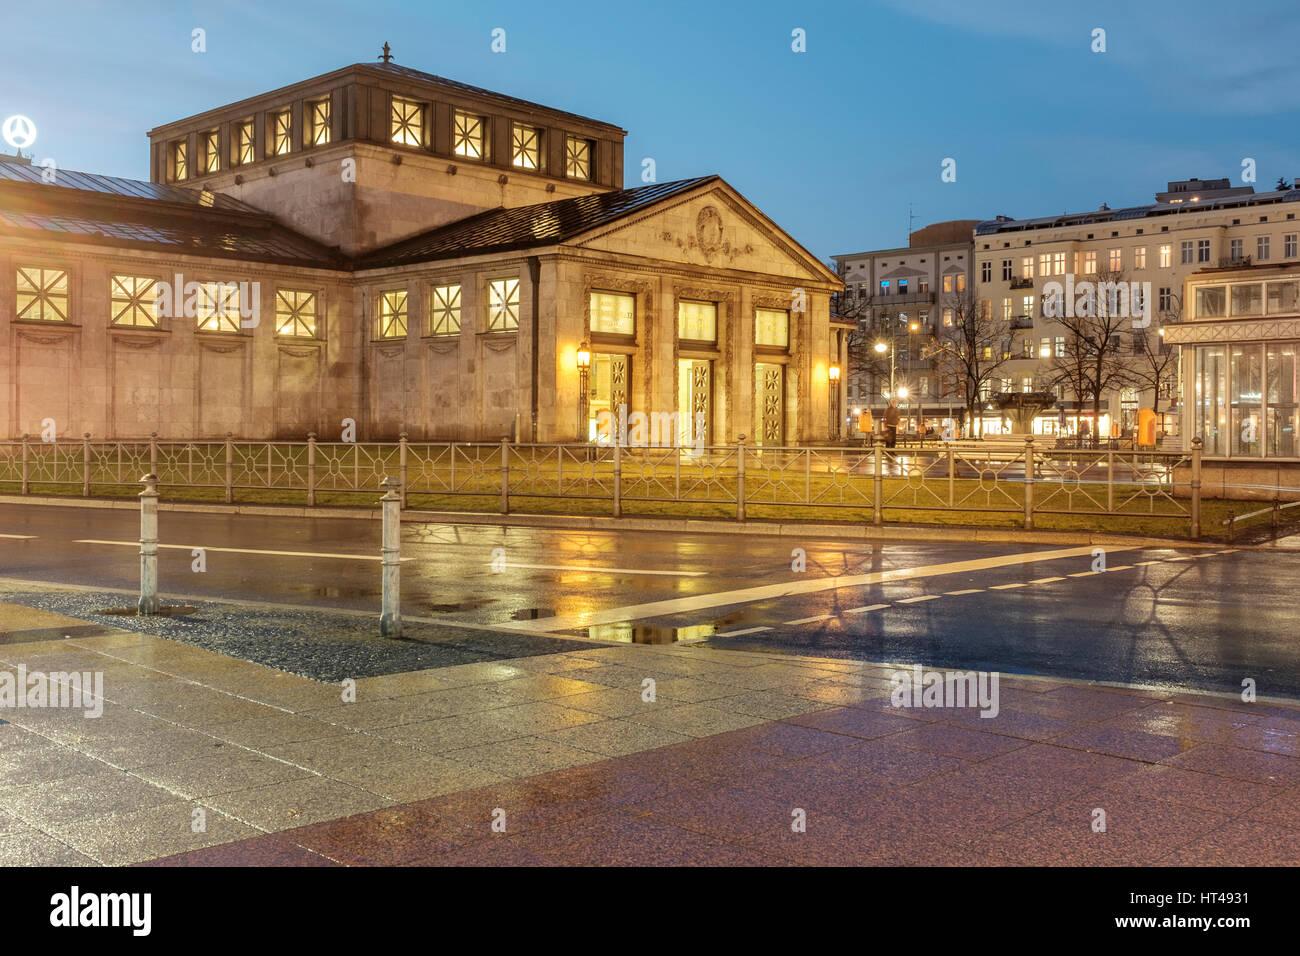 Wittenbergplatz (Wittenberg Square) is a large square in western Berlin at the end of Tauentzienstrasse.Wittenbergplatz - Stock Image